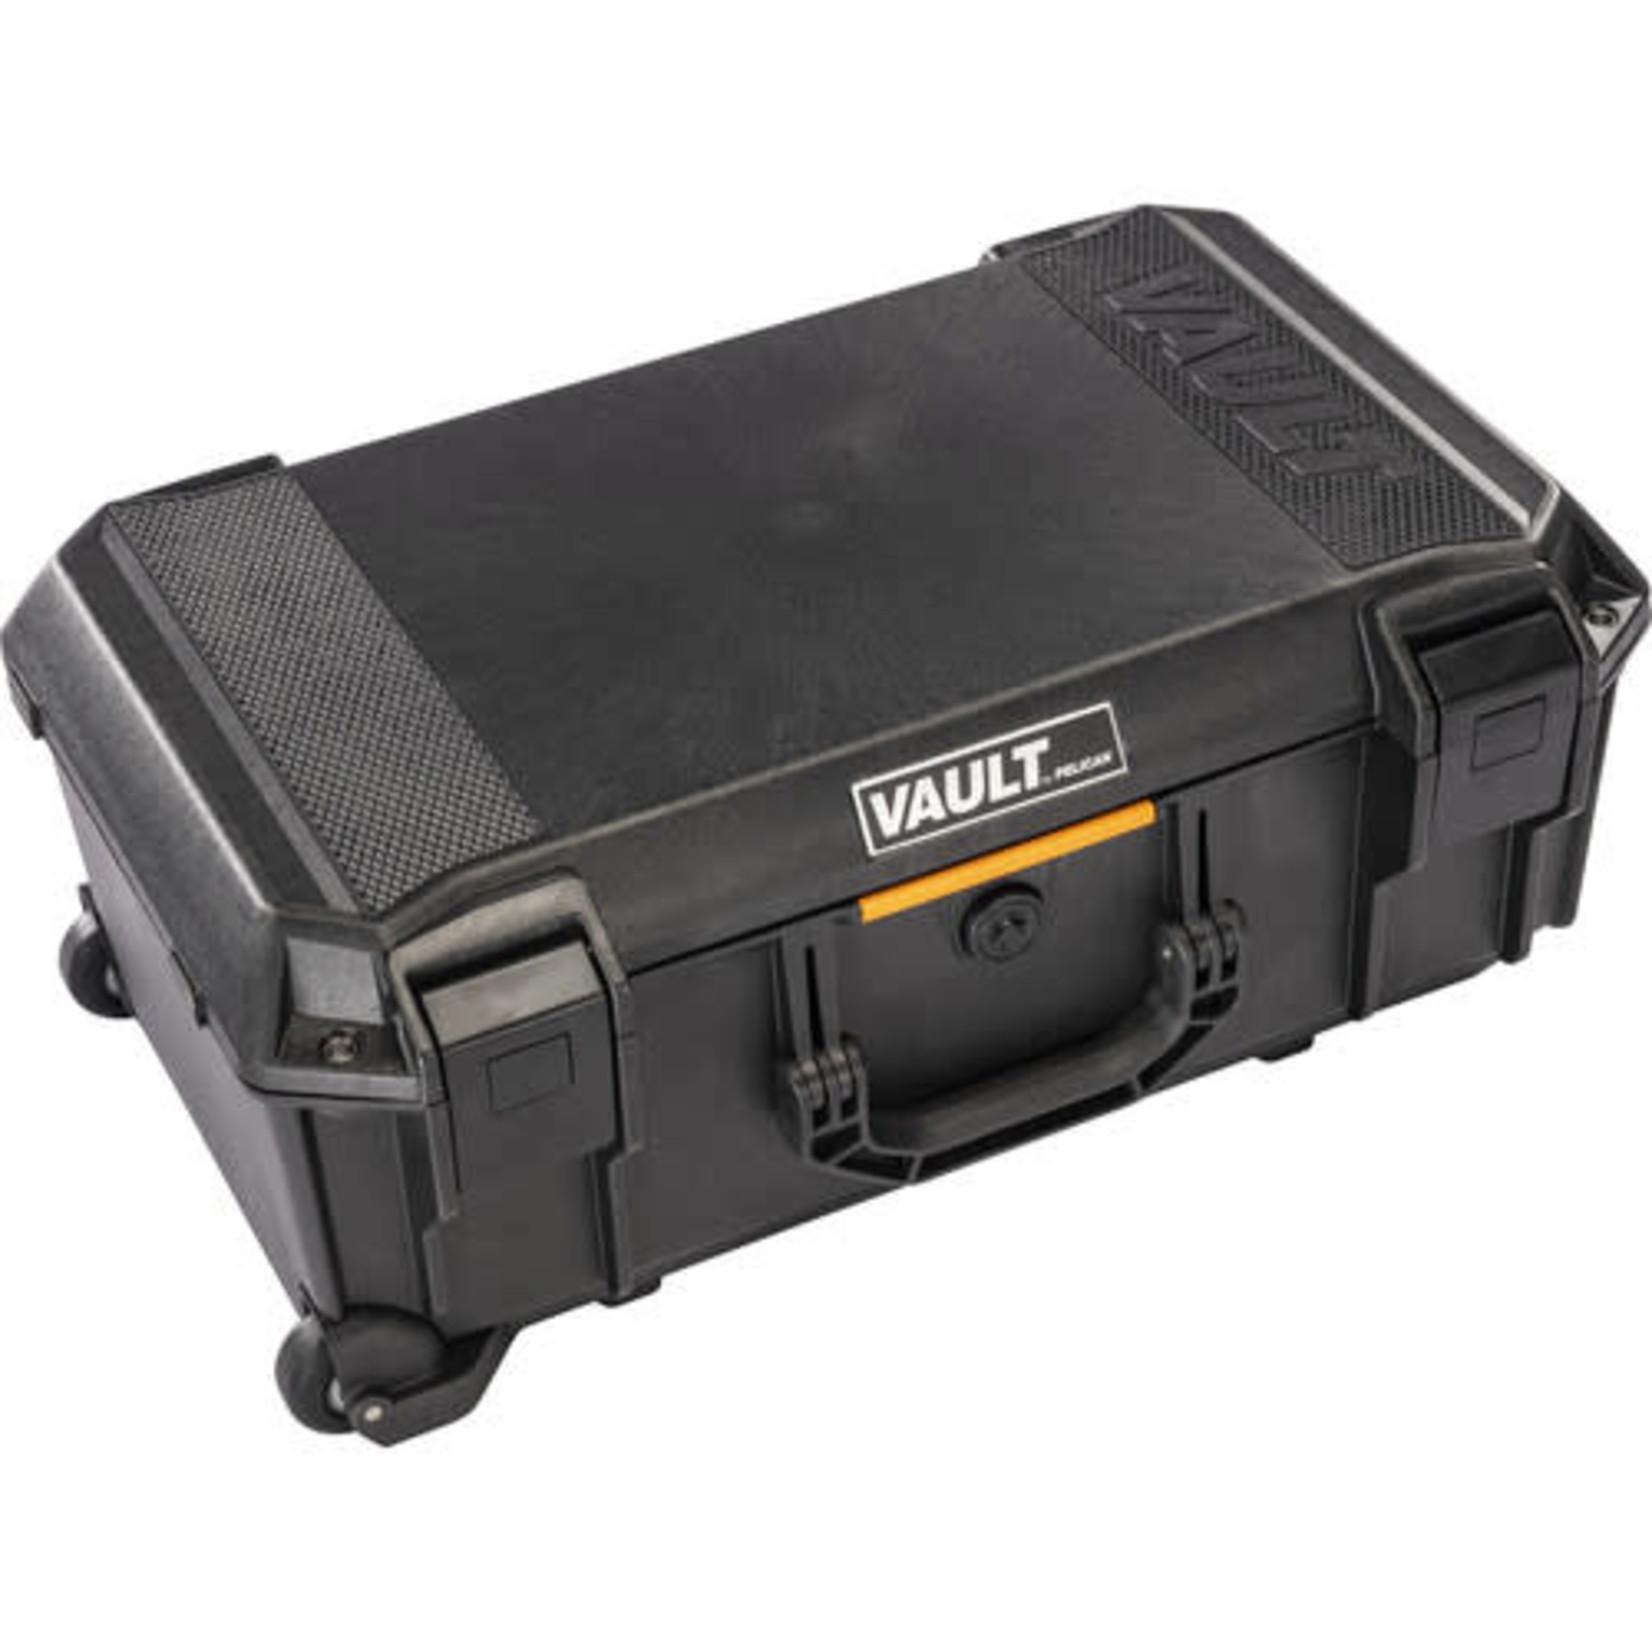 Pelican Pelican V525 Vault Rolling Hard Case with Padded Divider Insert (Black)